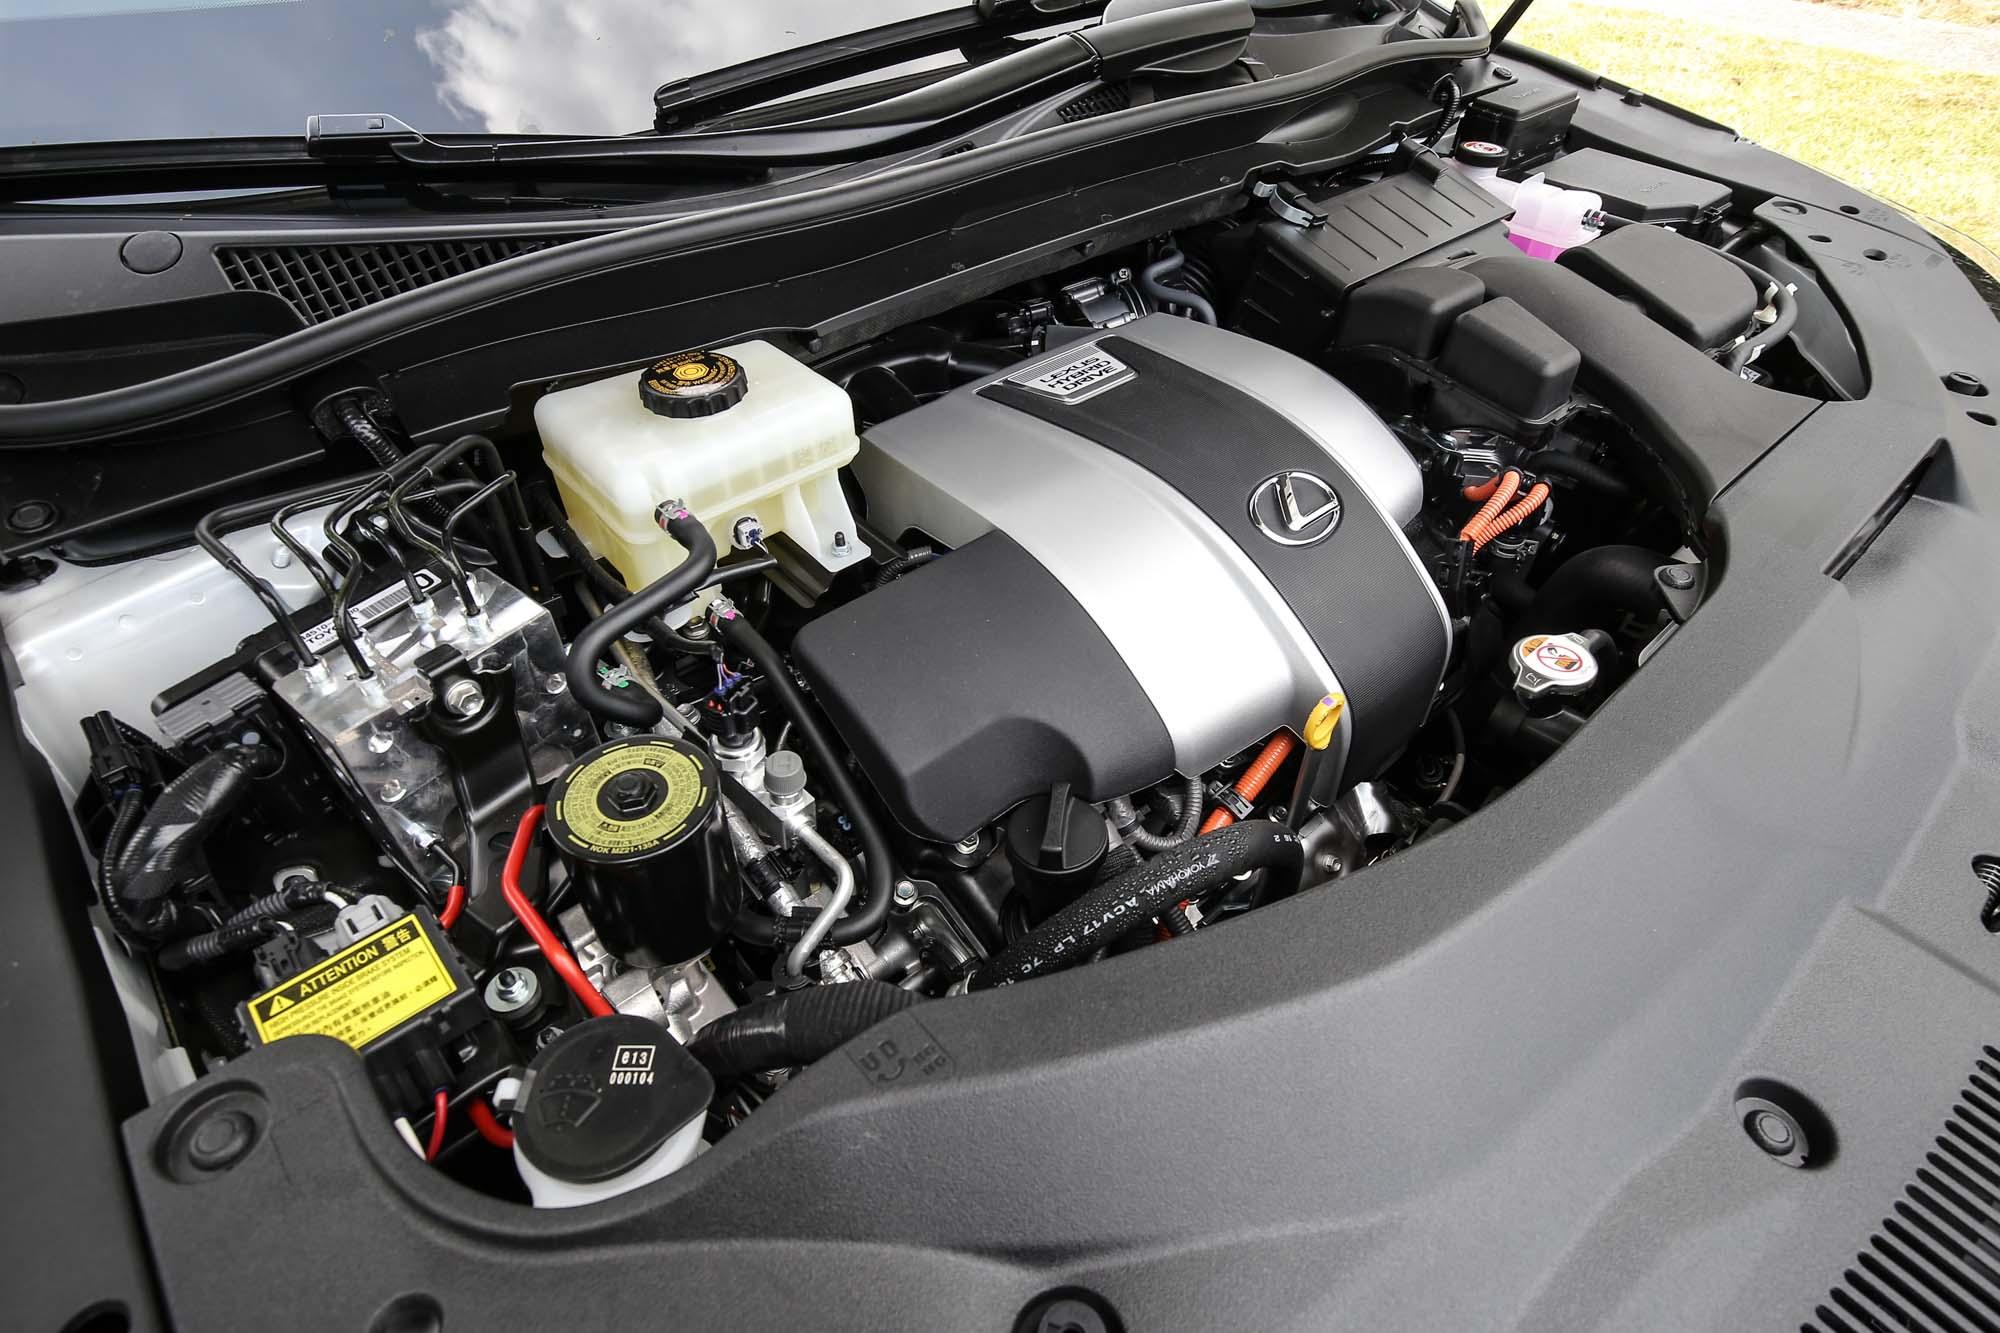 RX 450h 車型搭載 2GR-FXS 3.5 升 V6 引擎,具備 262ps / 6000rpm 最大馬力與 34.2kgm / 4600rpm 最大扭力輸出。